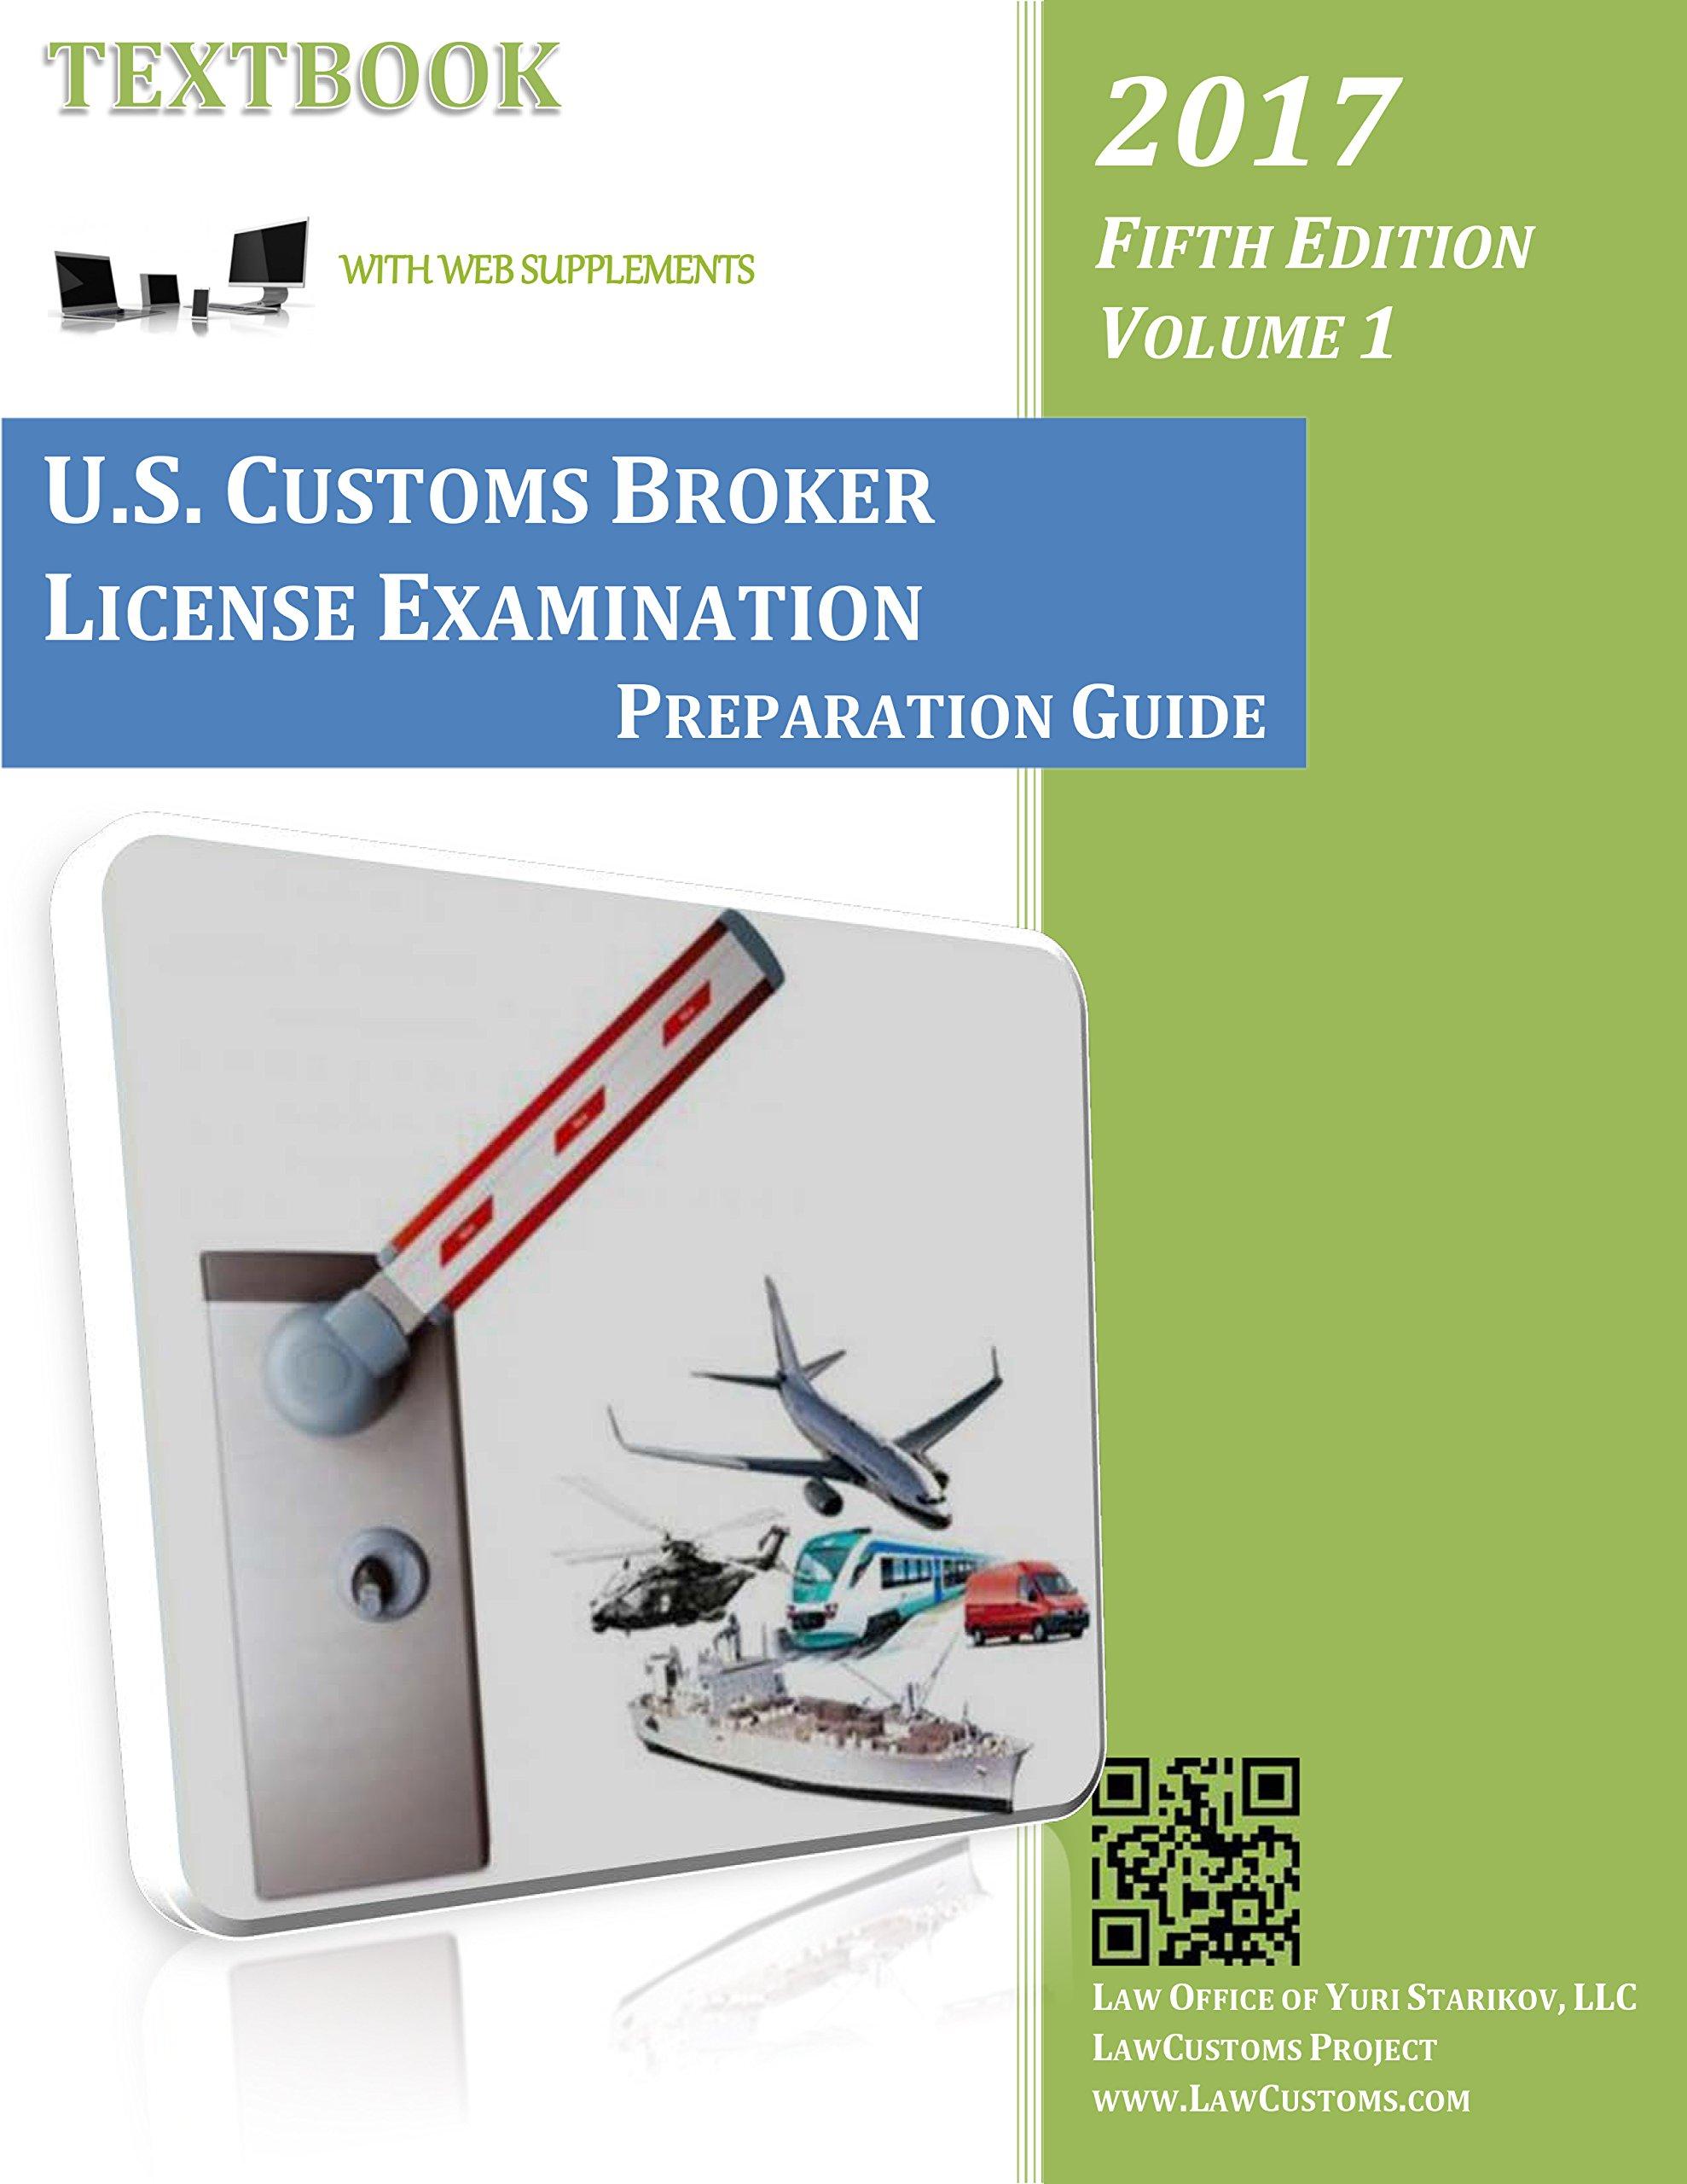 U.S. Customs Broker License Examination Preparation Guide Textbook (5th Ed.  Vol. 1, 2017): Law Office of Yuri Starikov LLC: 9781944329570: Amazon.com:  Books